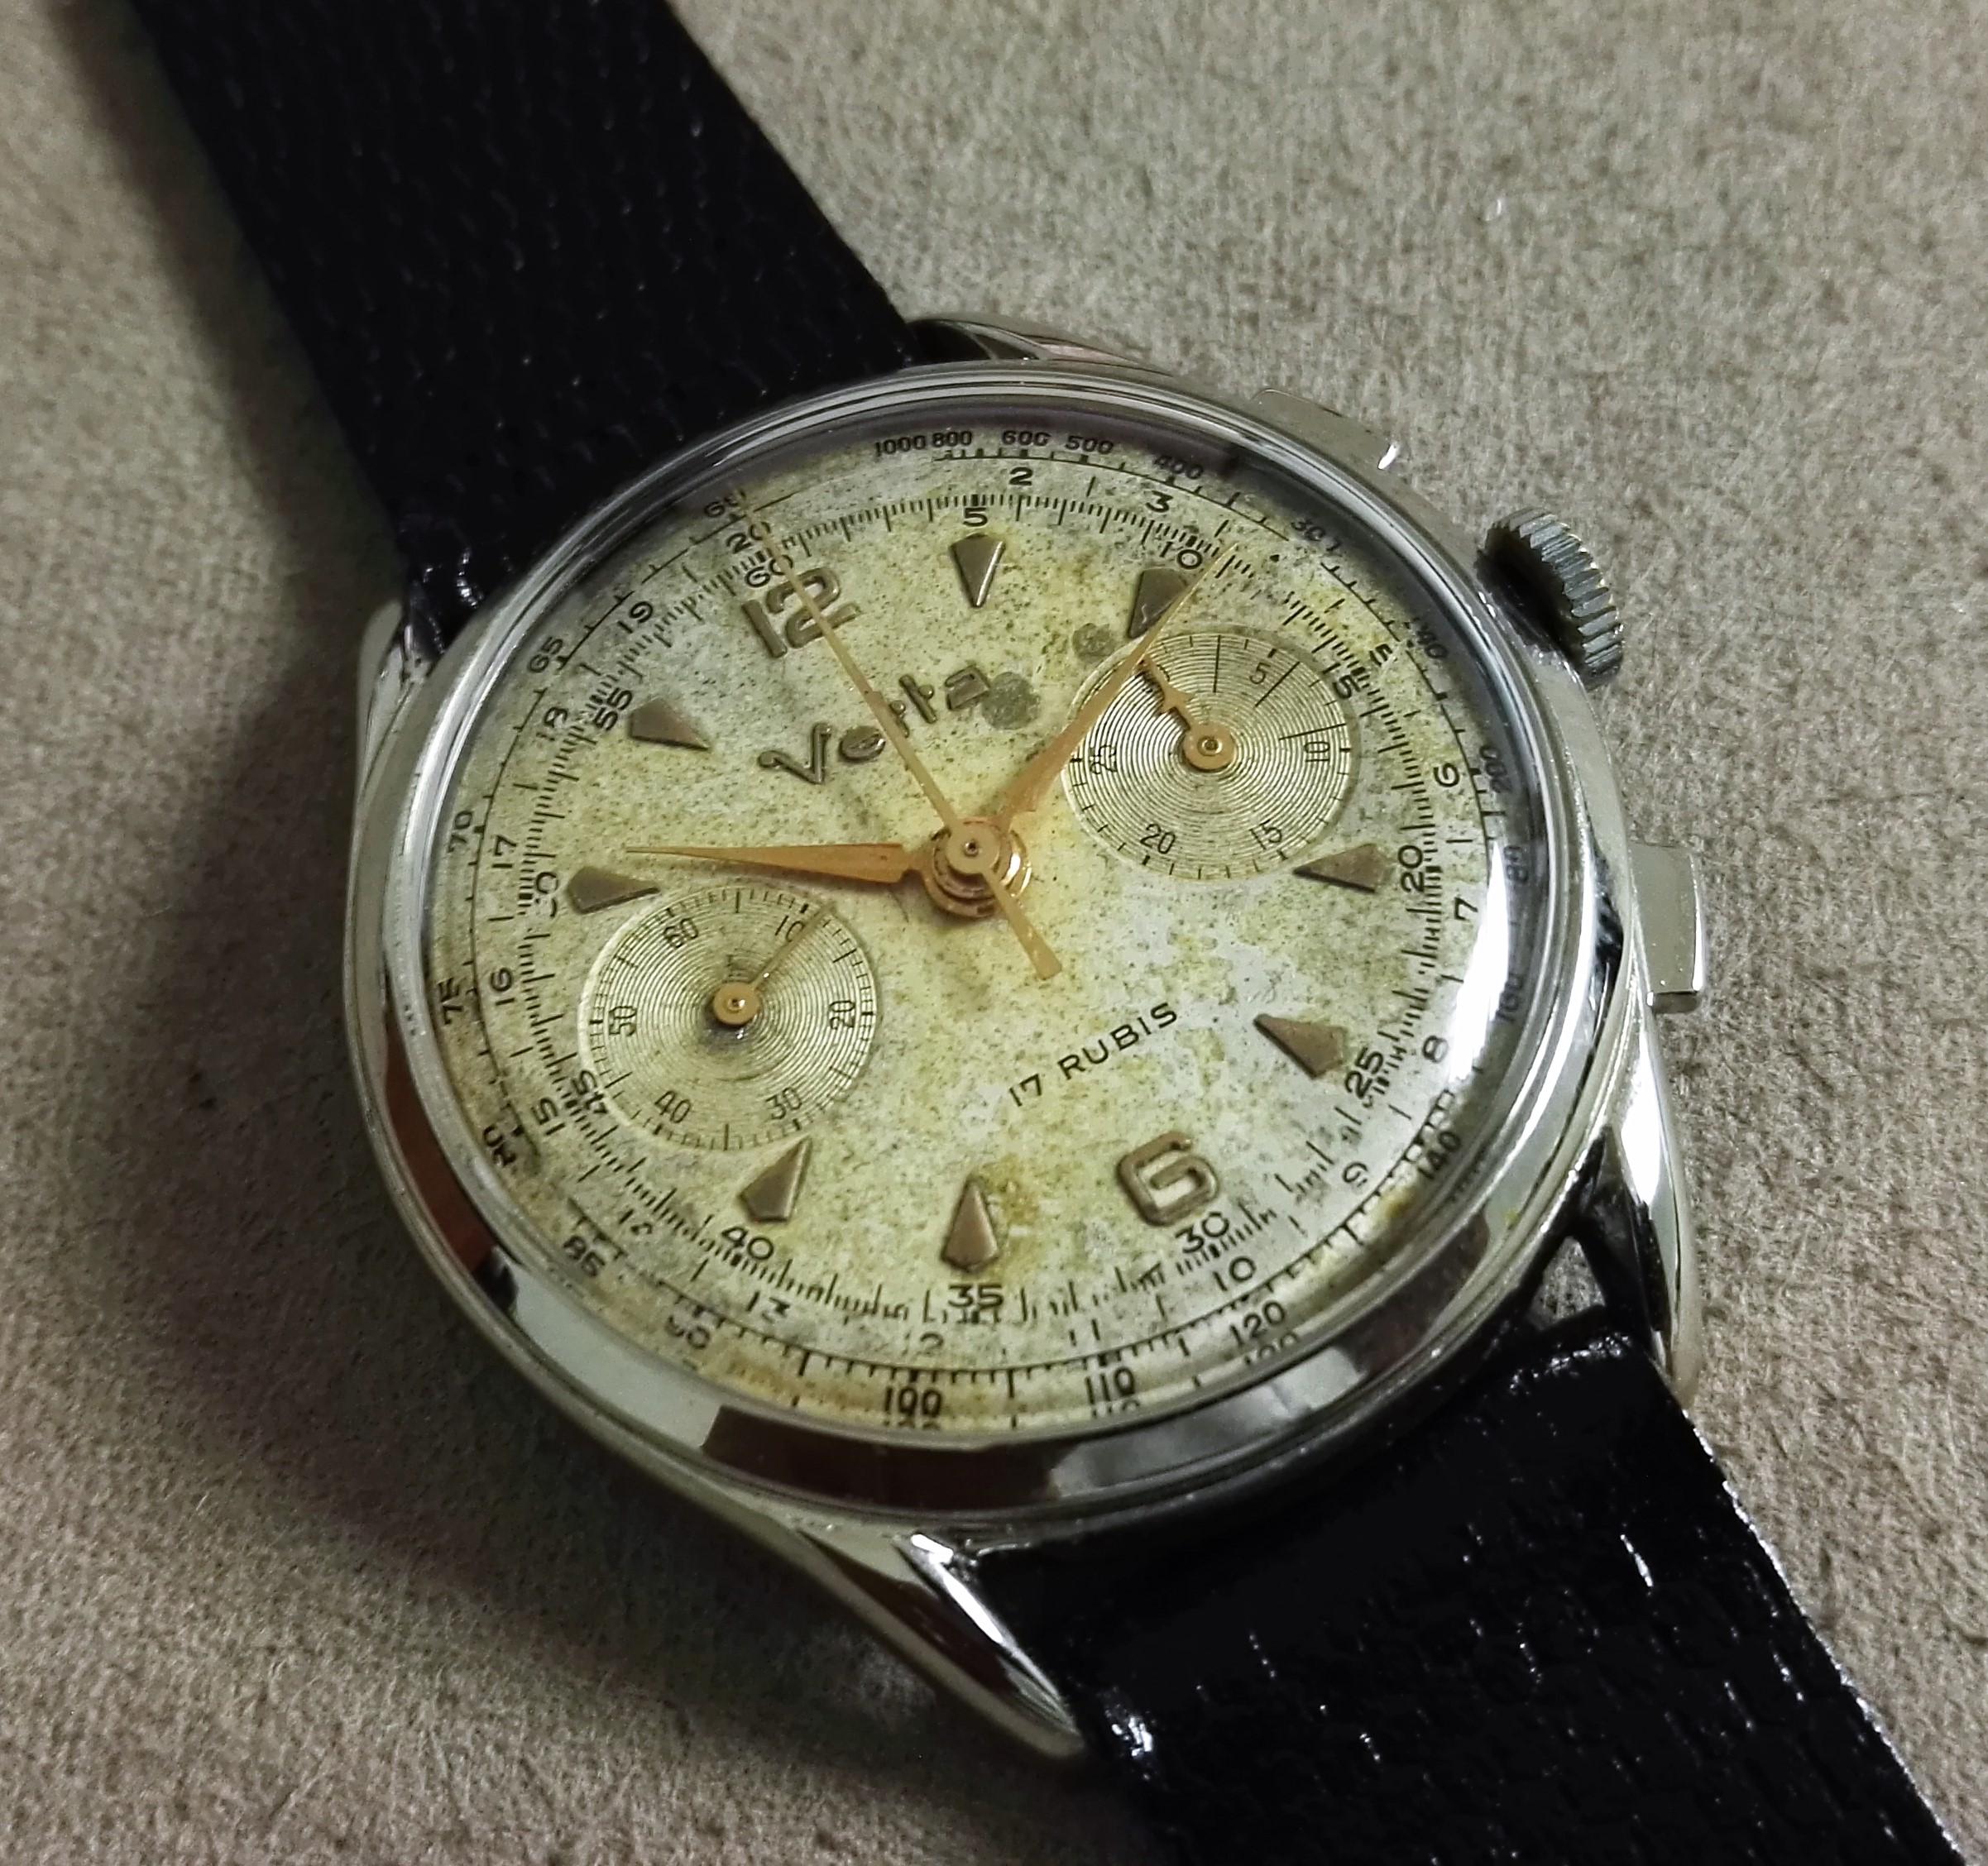 Anonimo Vetta Vintage chronograph oversize Valjoux 23 mm 38 just serviced | San Giorgio a Cremano